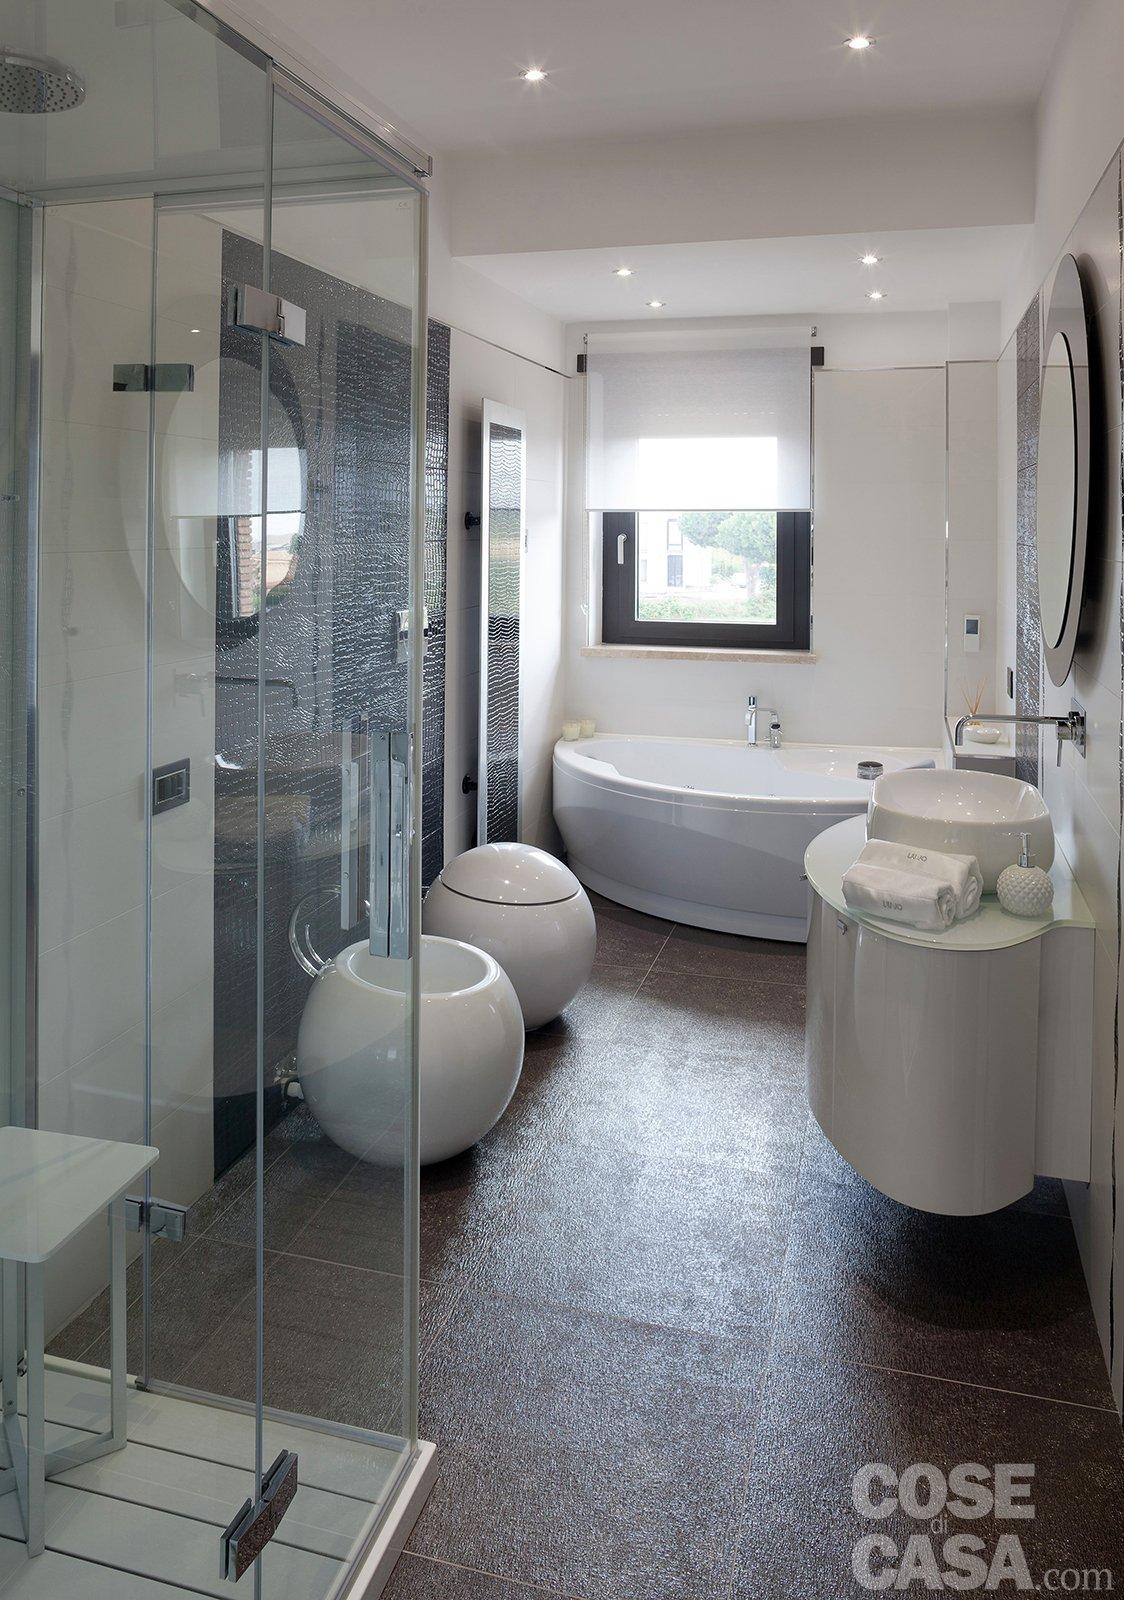 Mobili Arredo Bagno Obi: Arredo bagno mariani showroom.